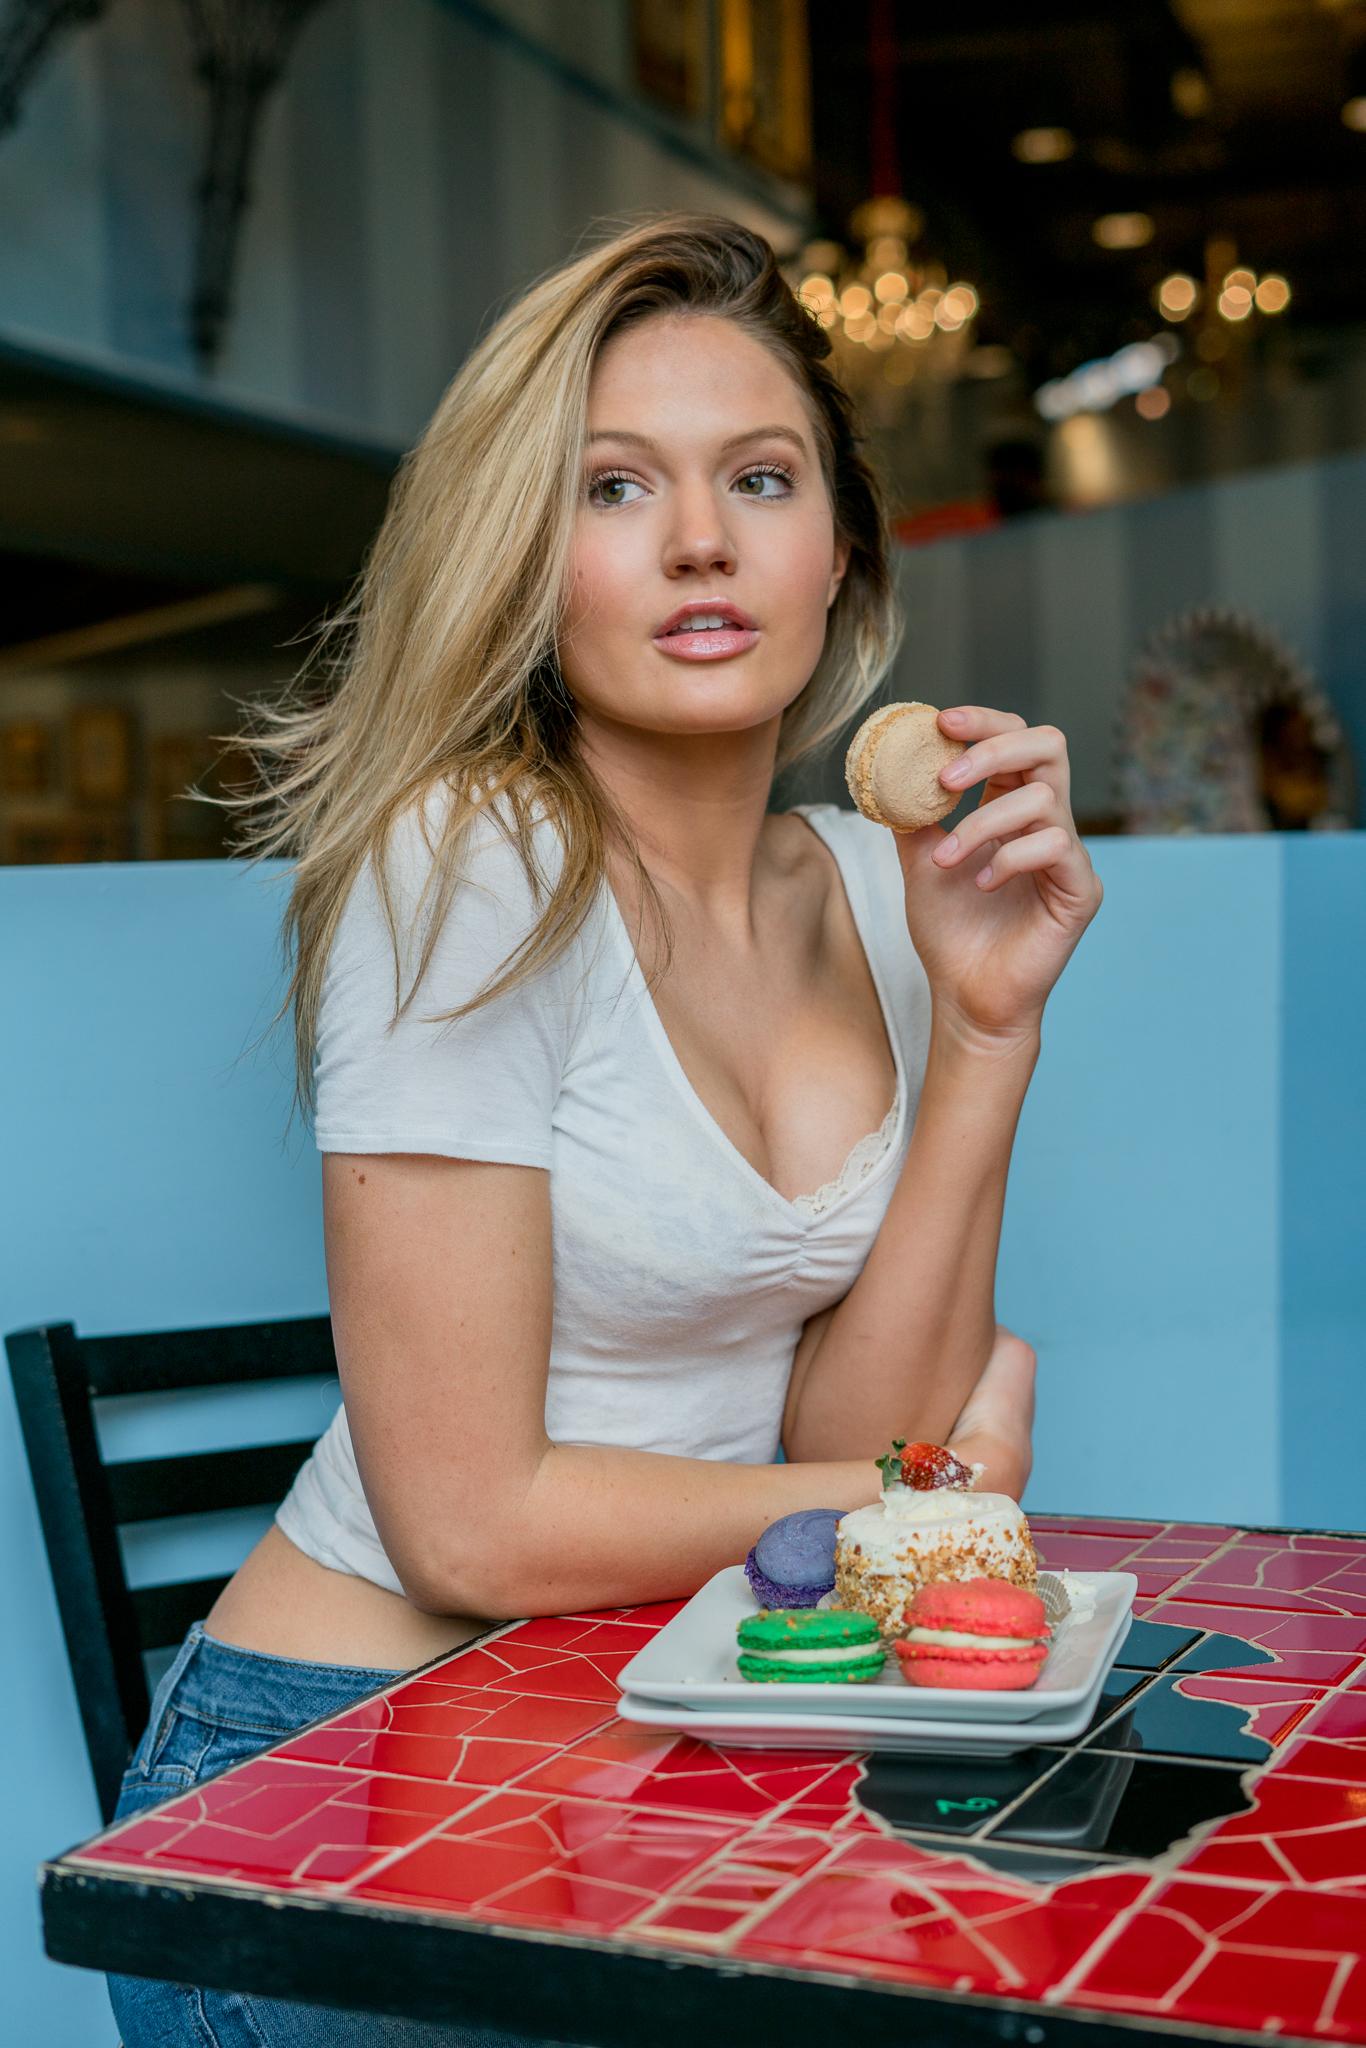 Wallpaper : Summer Lynn Hart, blonde, portrait, white tops